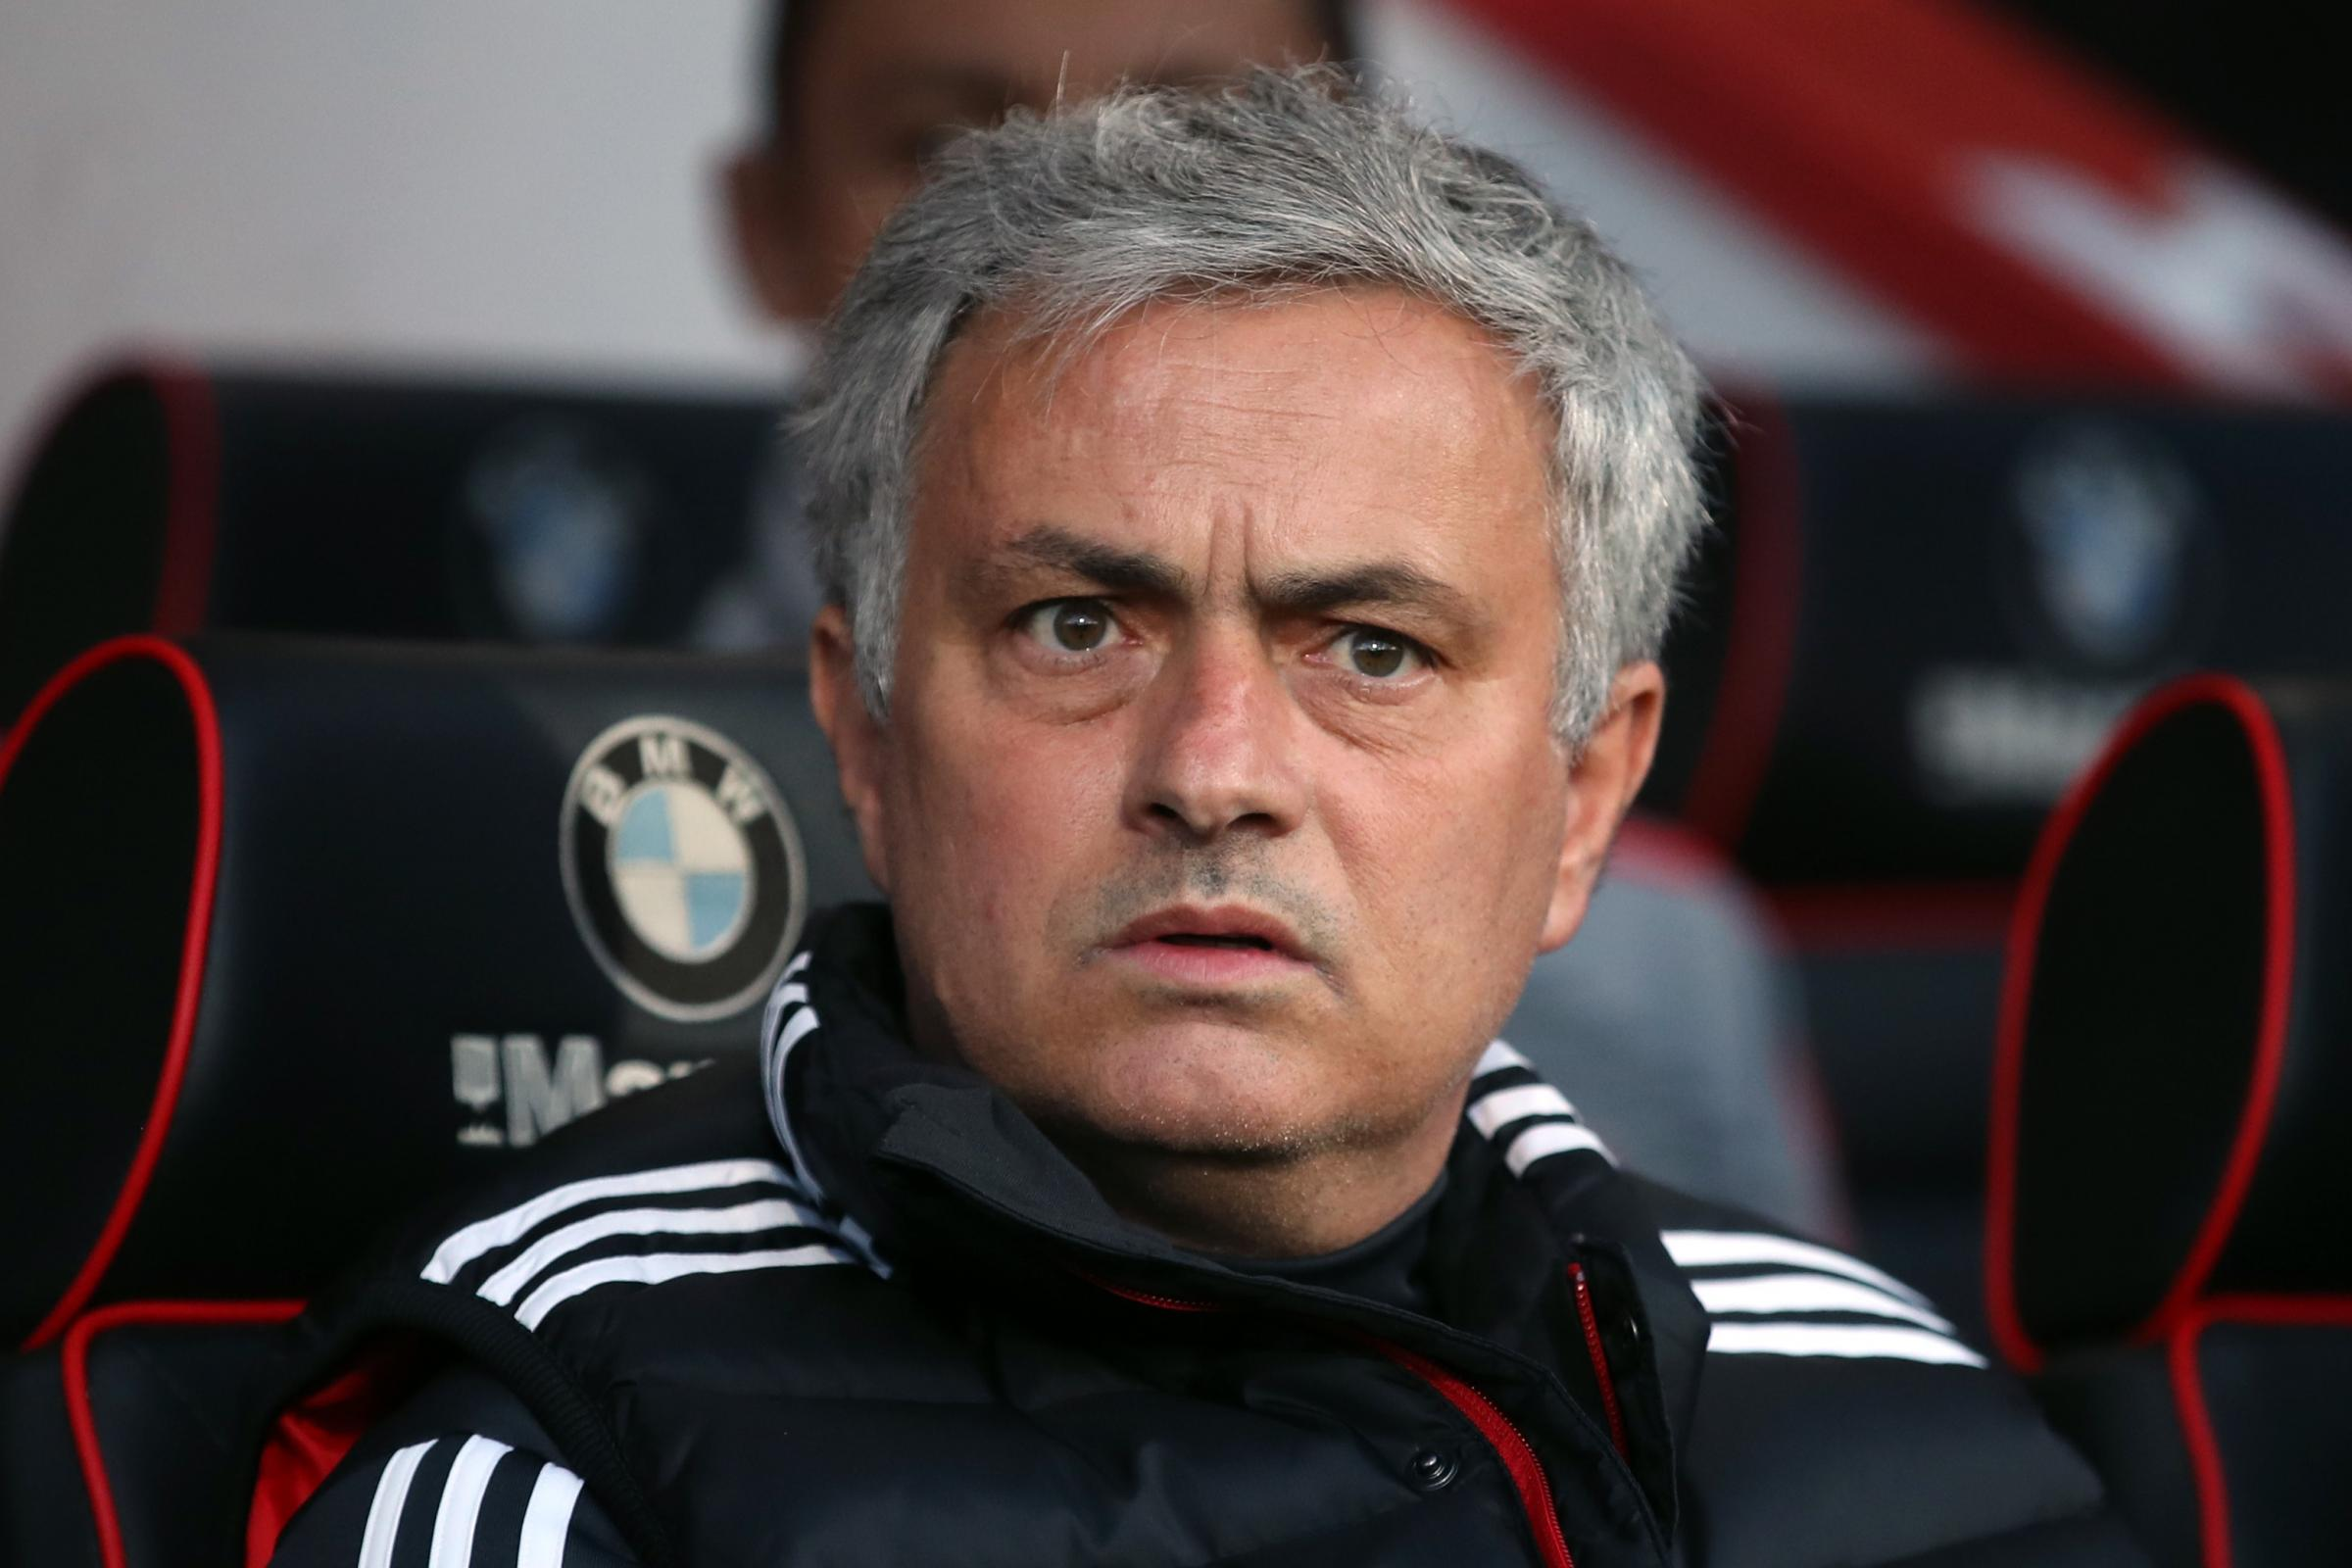 Man Utd hero McGrath: Lighten up Jose and work with Pogba!